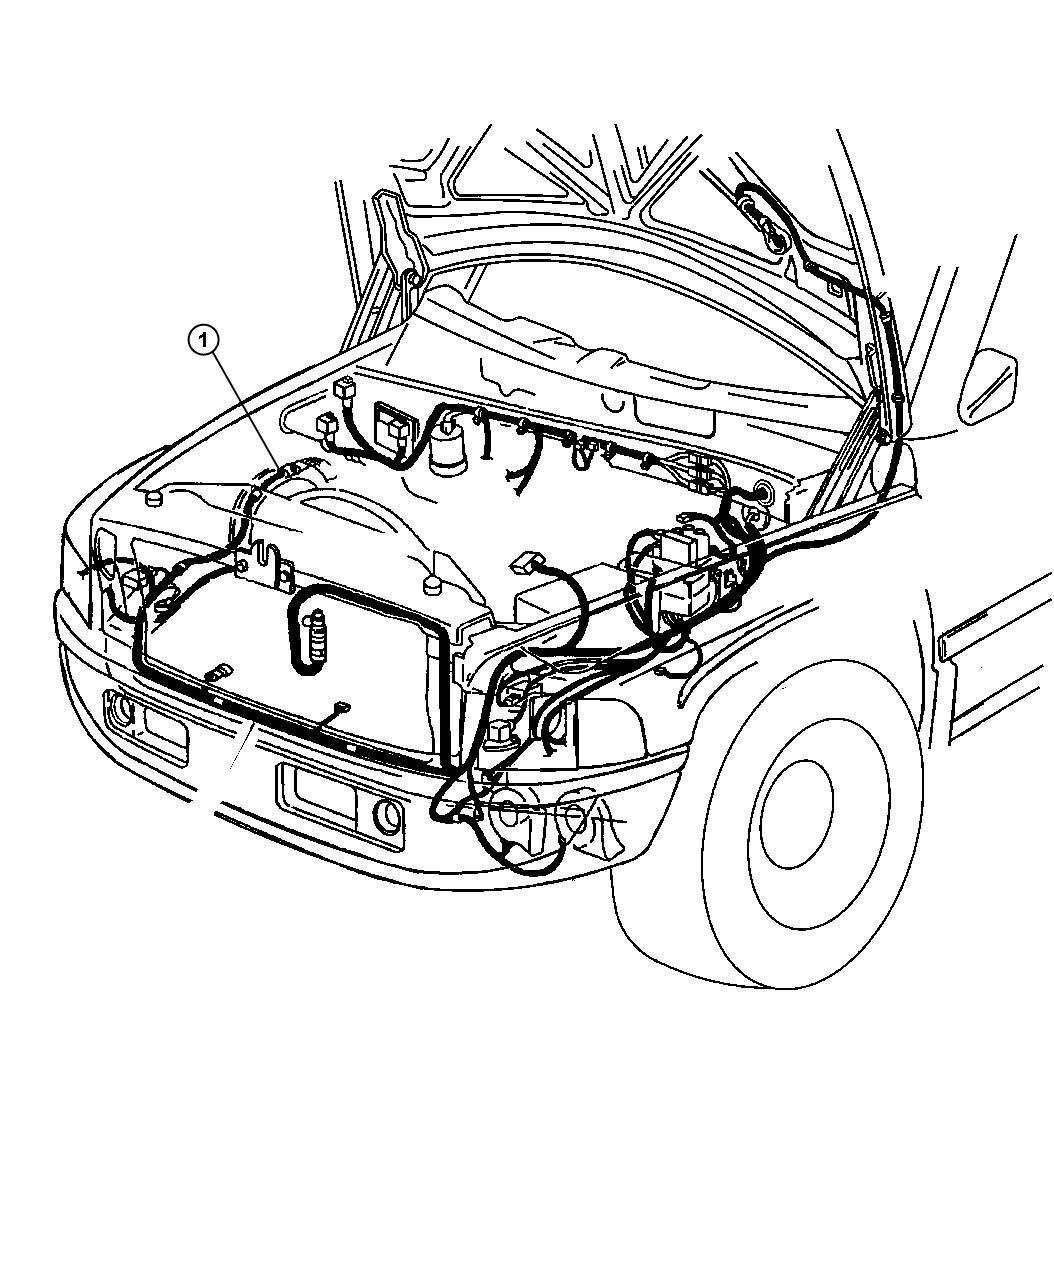 Dodge Ram 3500 Wiring. Headlamp to dash. Elec, disc, case